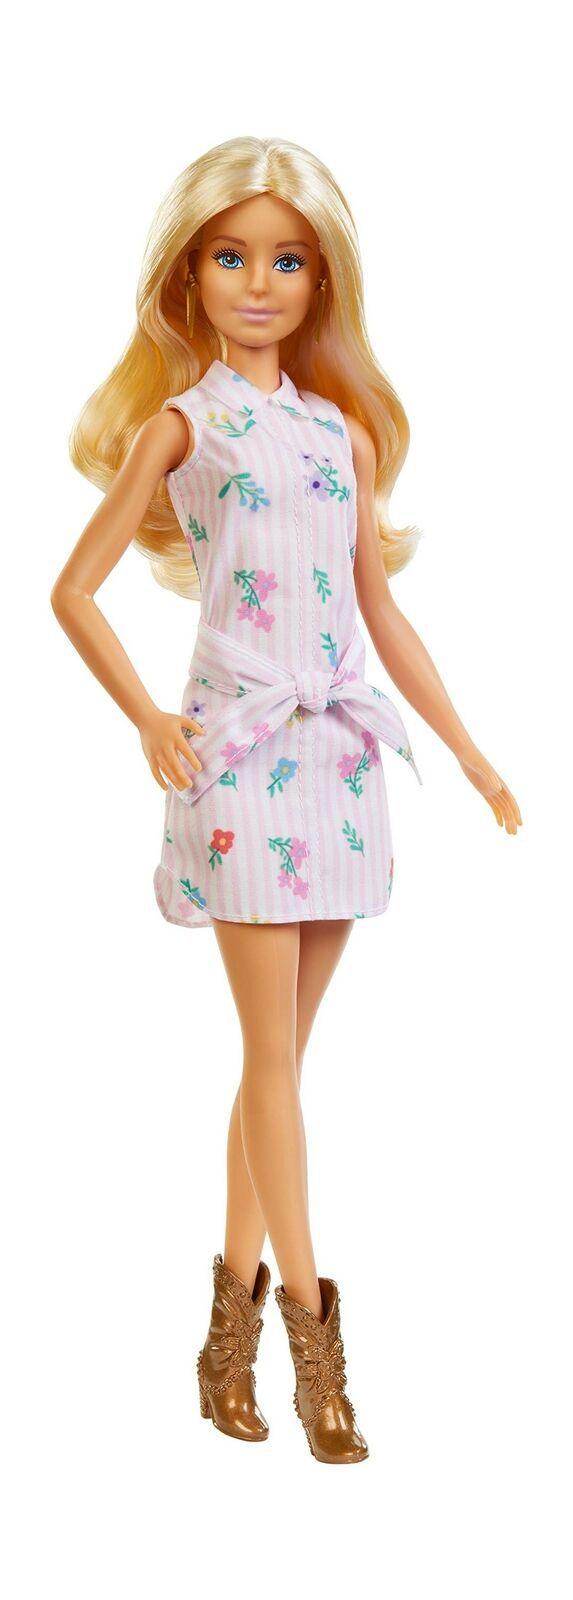 Boneca Barbie: Fashionista #119 - Mattel